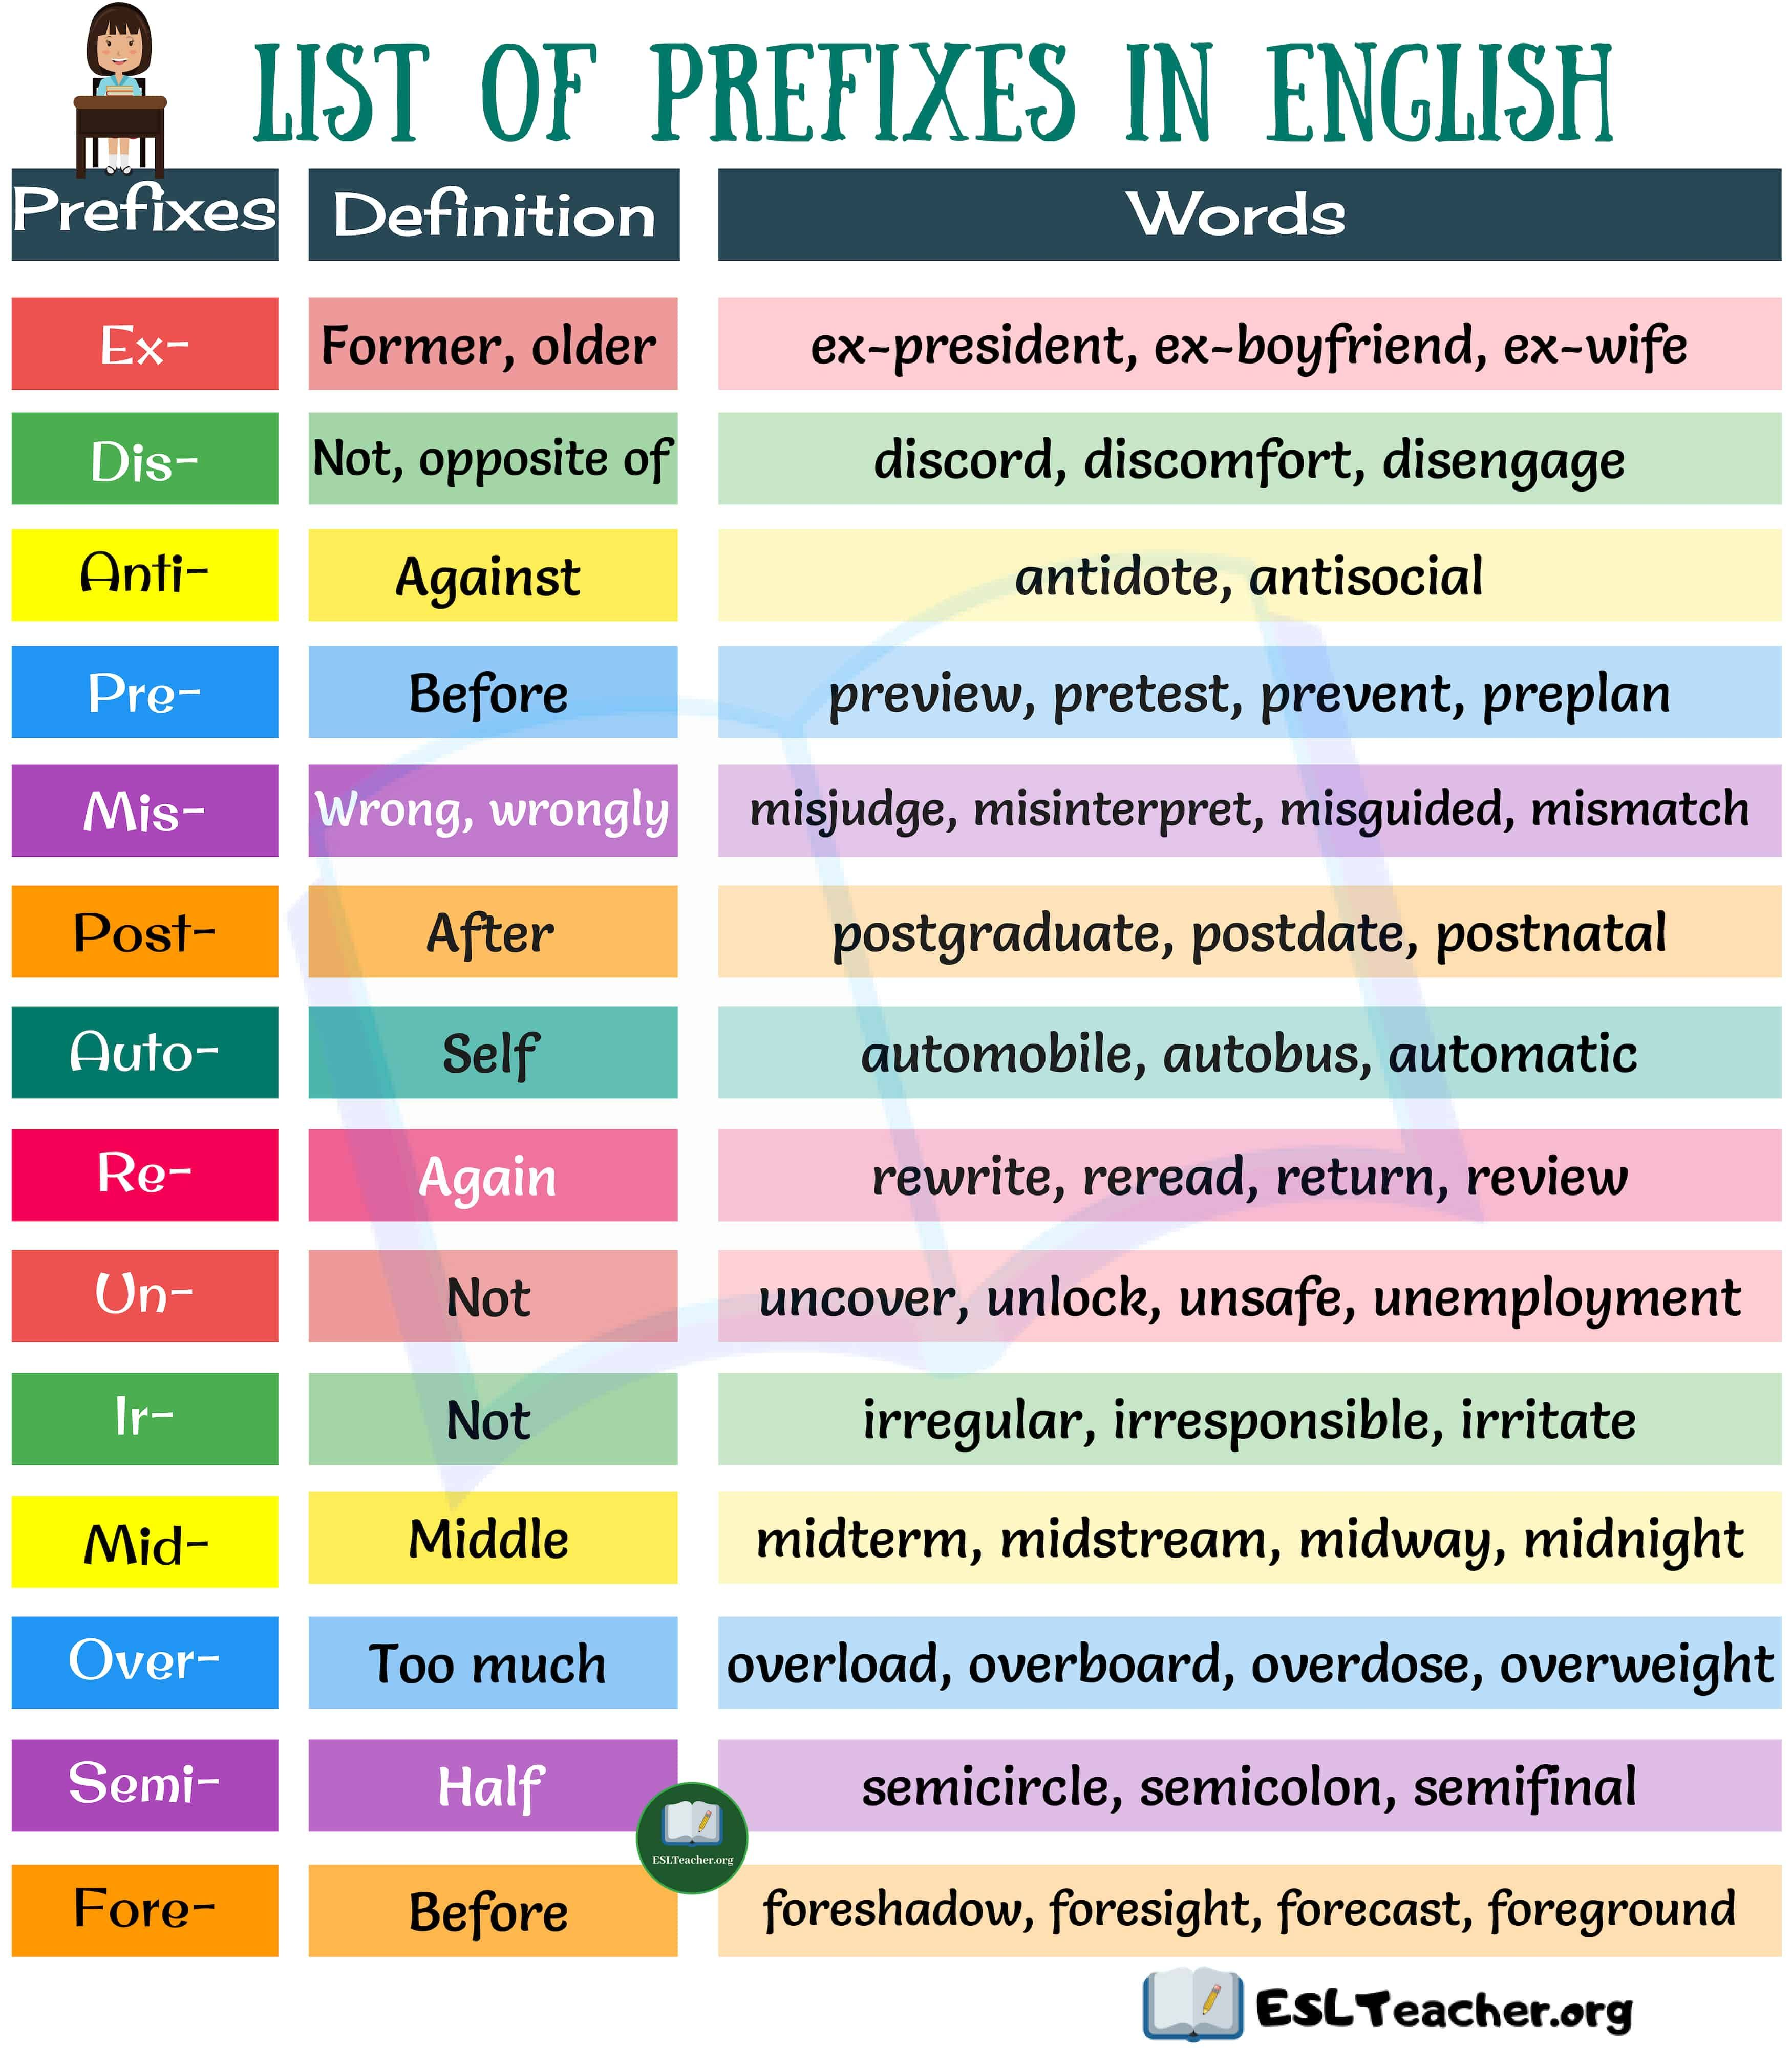 List Of Prefixes A Big List Of 20 Prefixes And Their